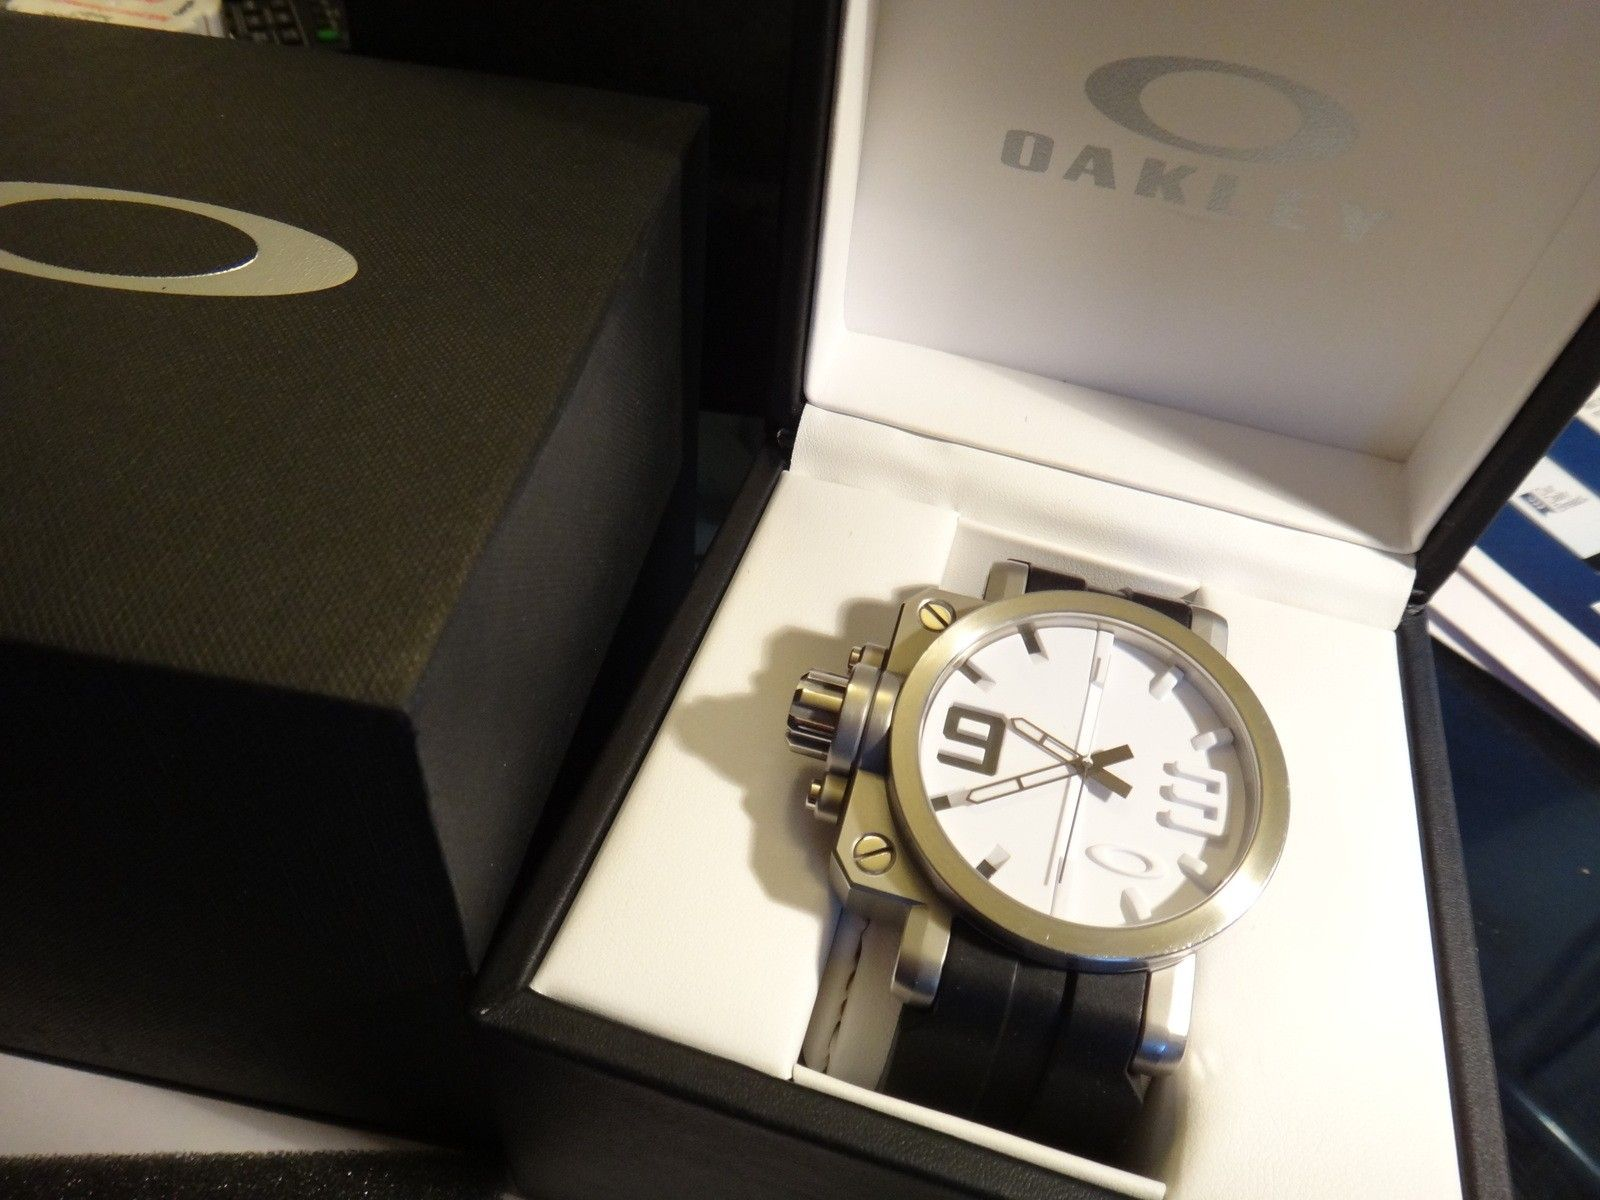 Oakley Gearbox brushed WHITE dial 10-064 stainless steel - DSC05731.JPG